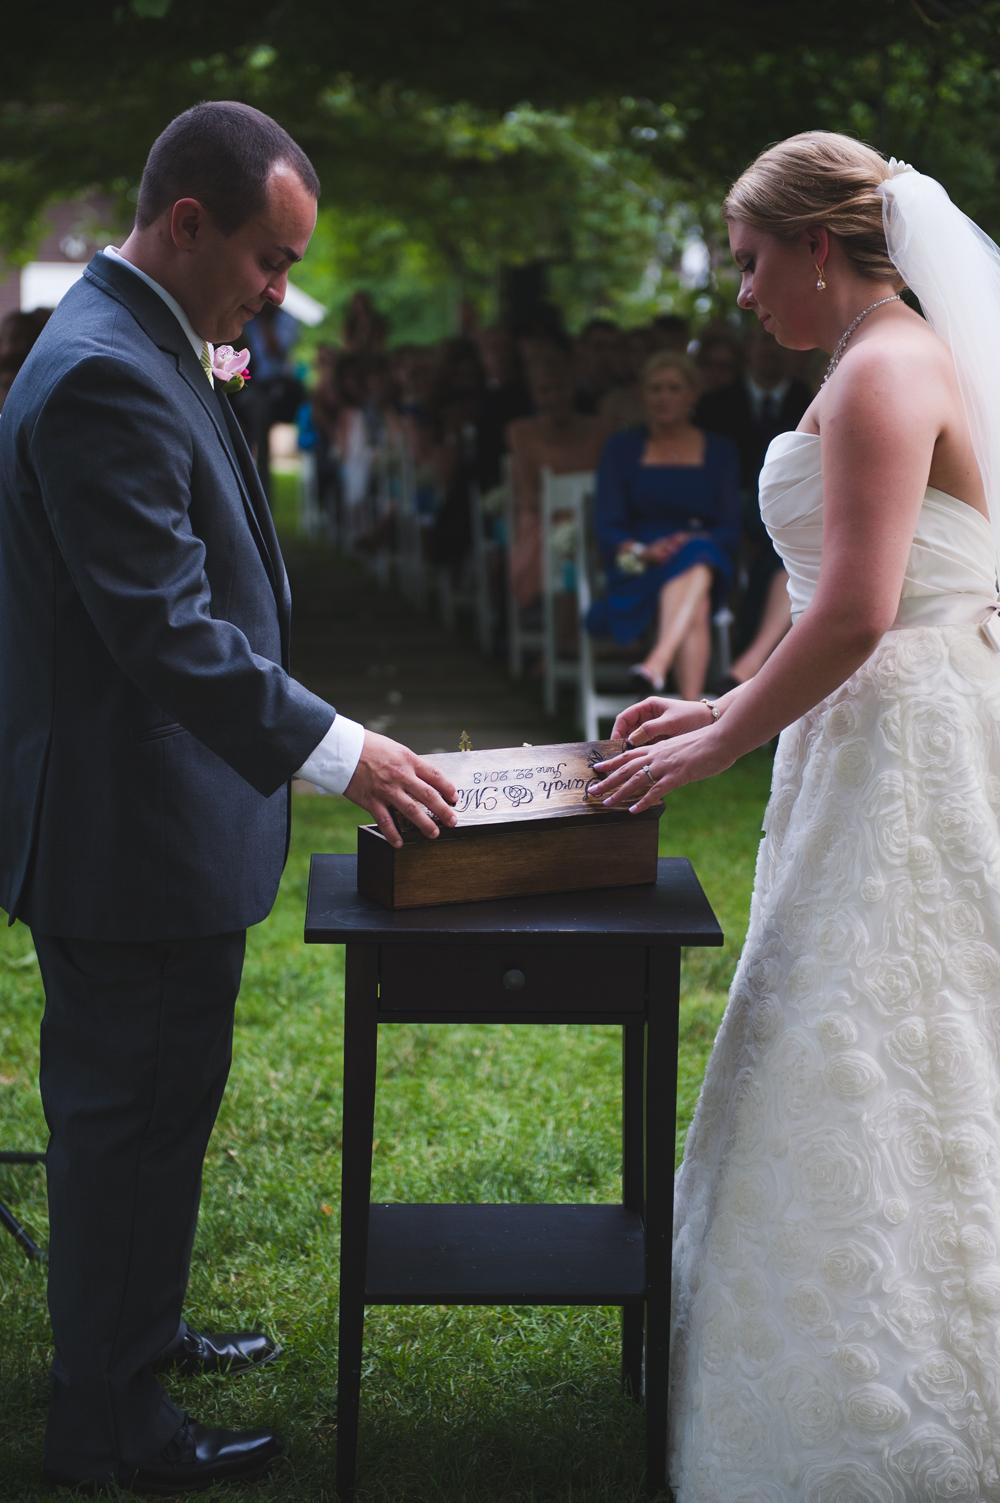 Tarrywile-Mansion-Wedding-Greg-Lewis-Photo-52